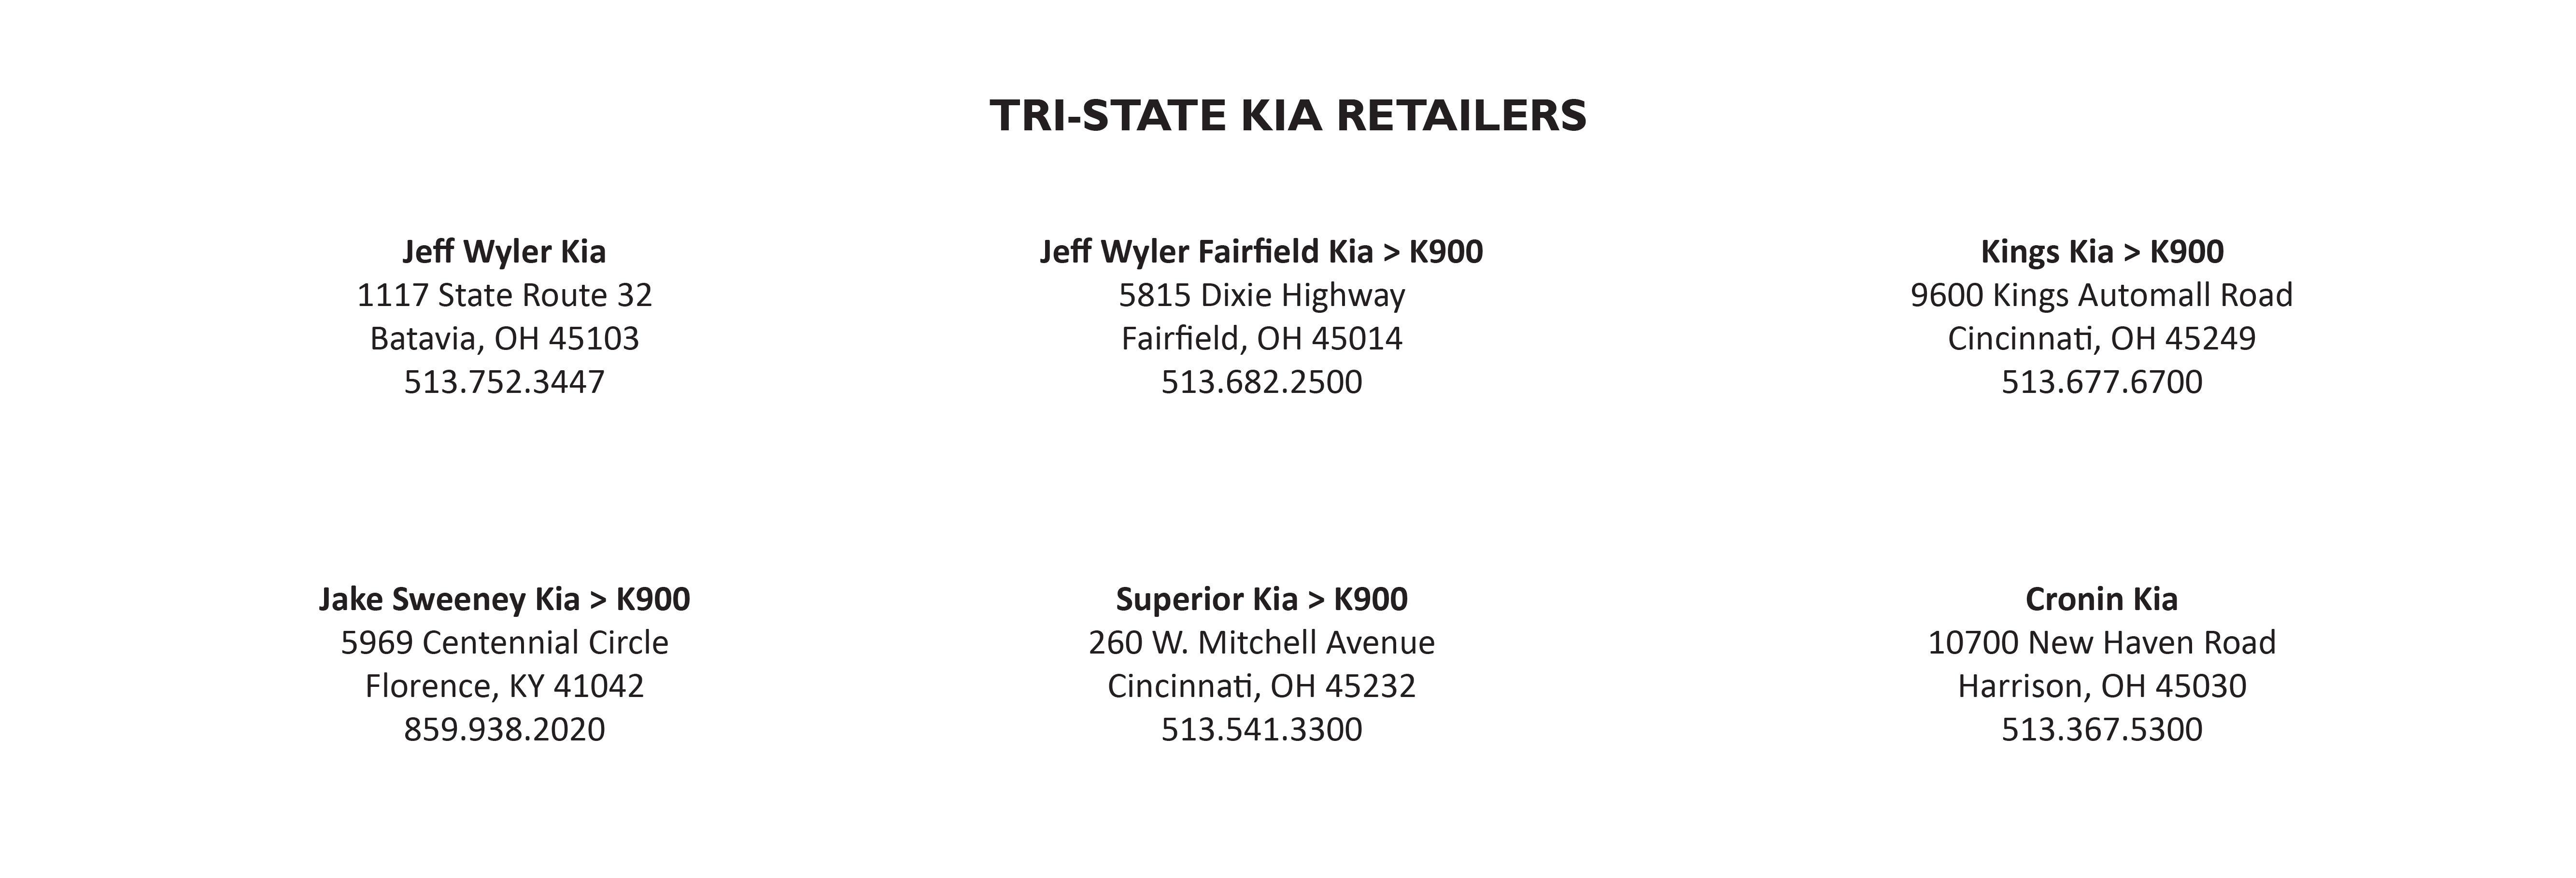 KIA-Landing_Page-Tri-State_Retailers-01